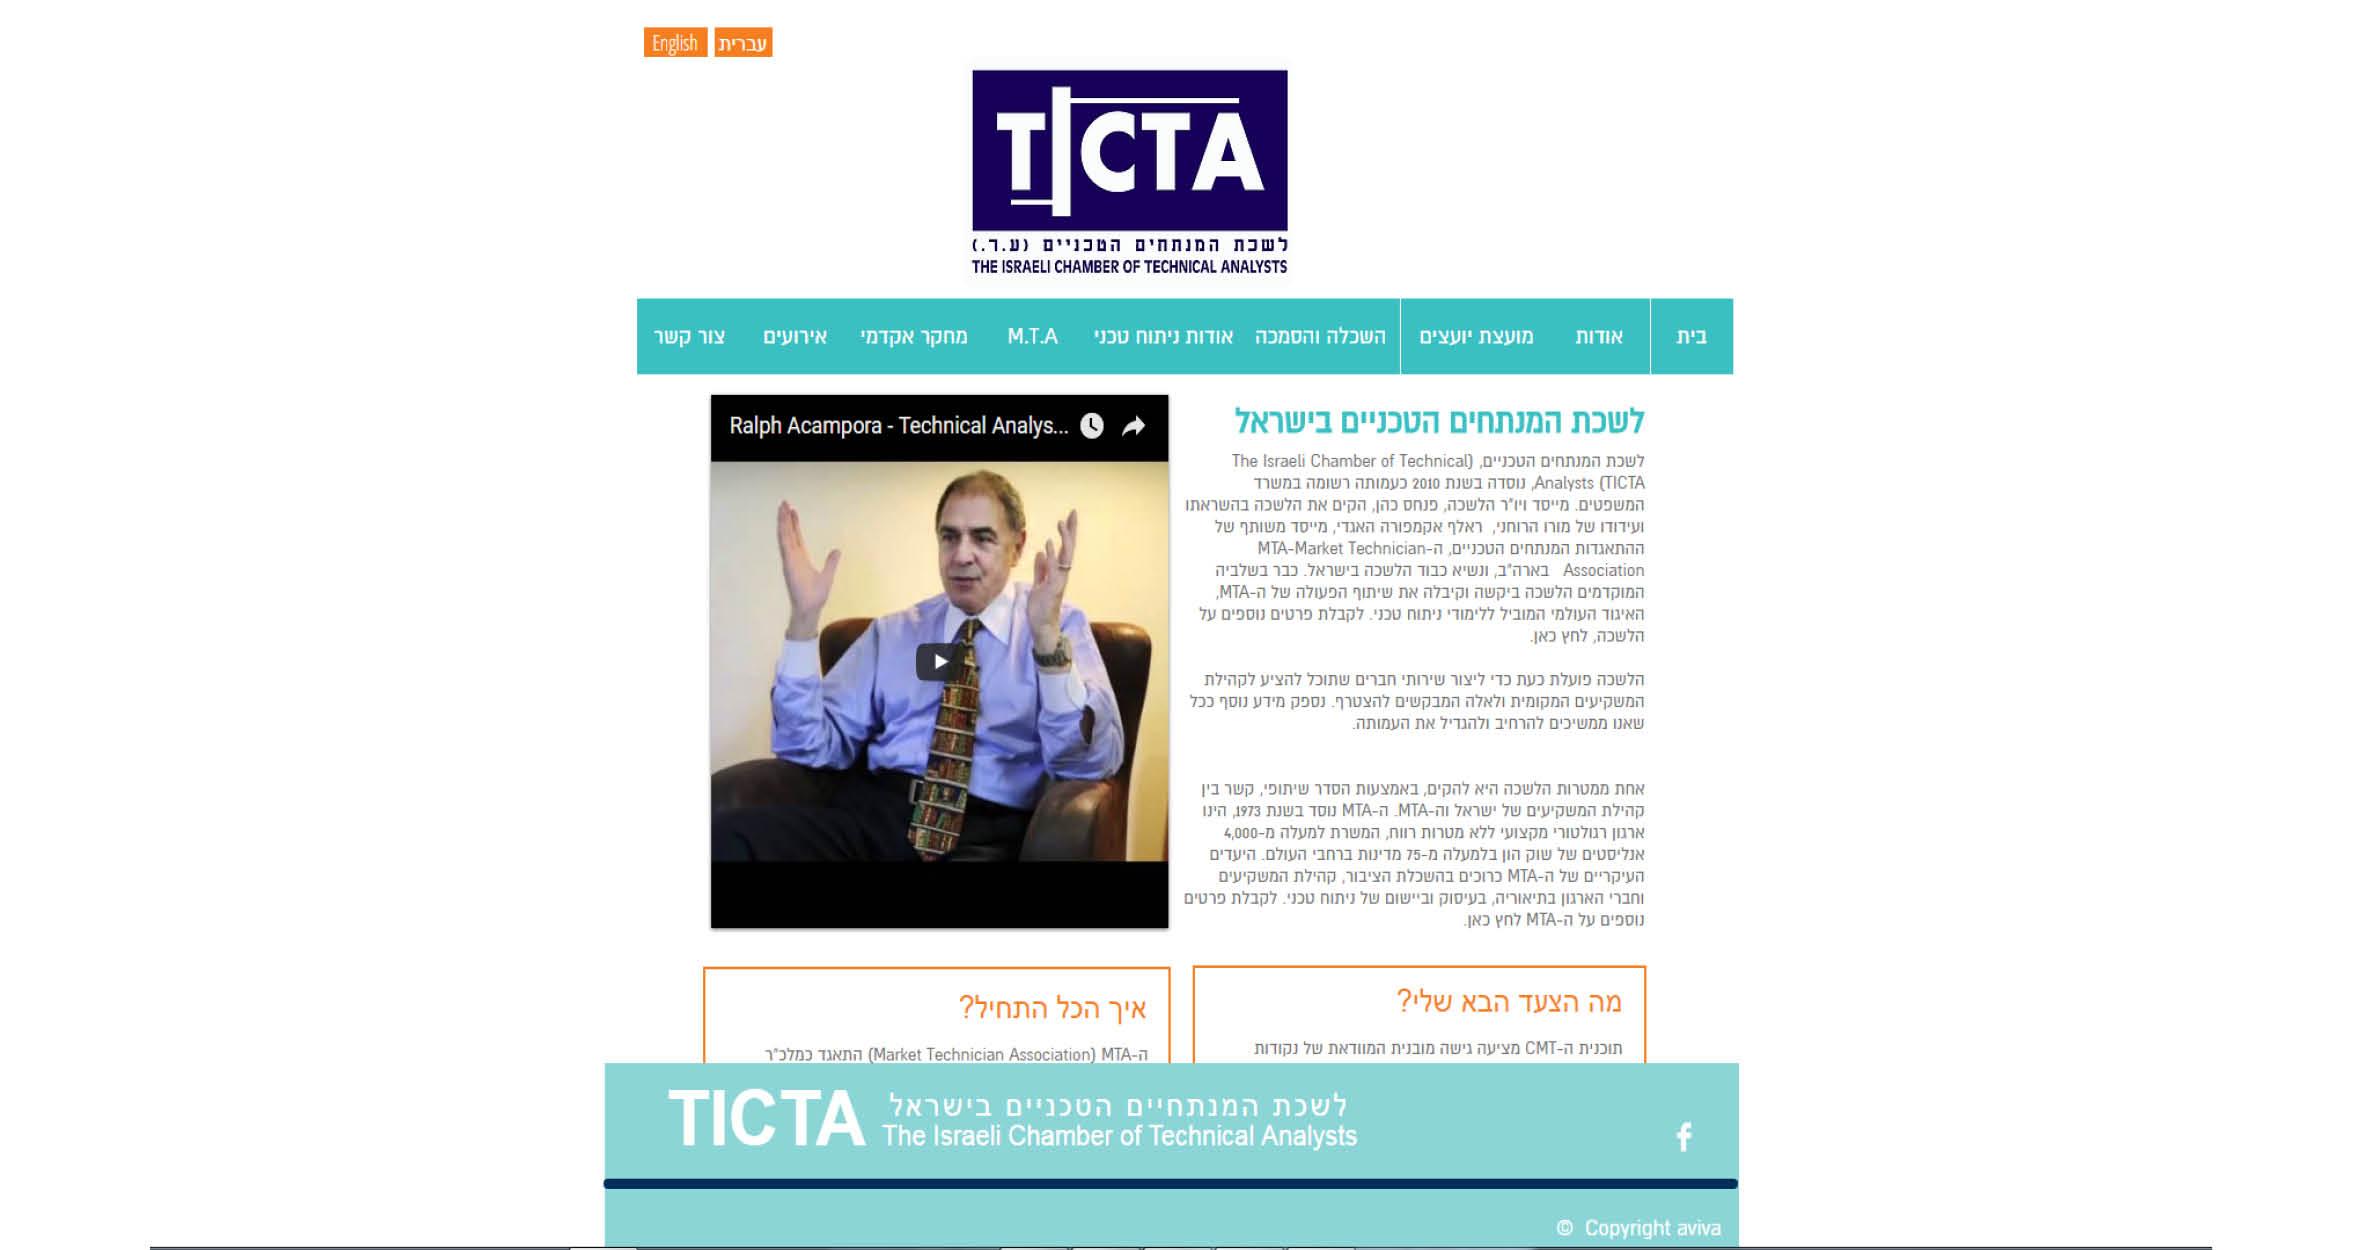 Ticta1